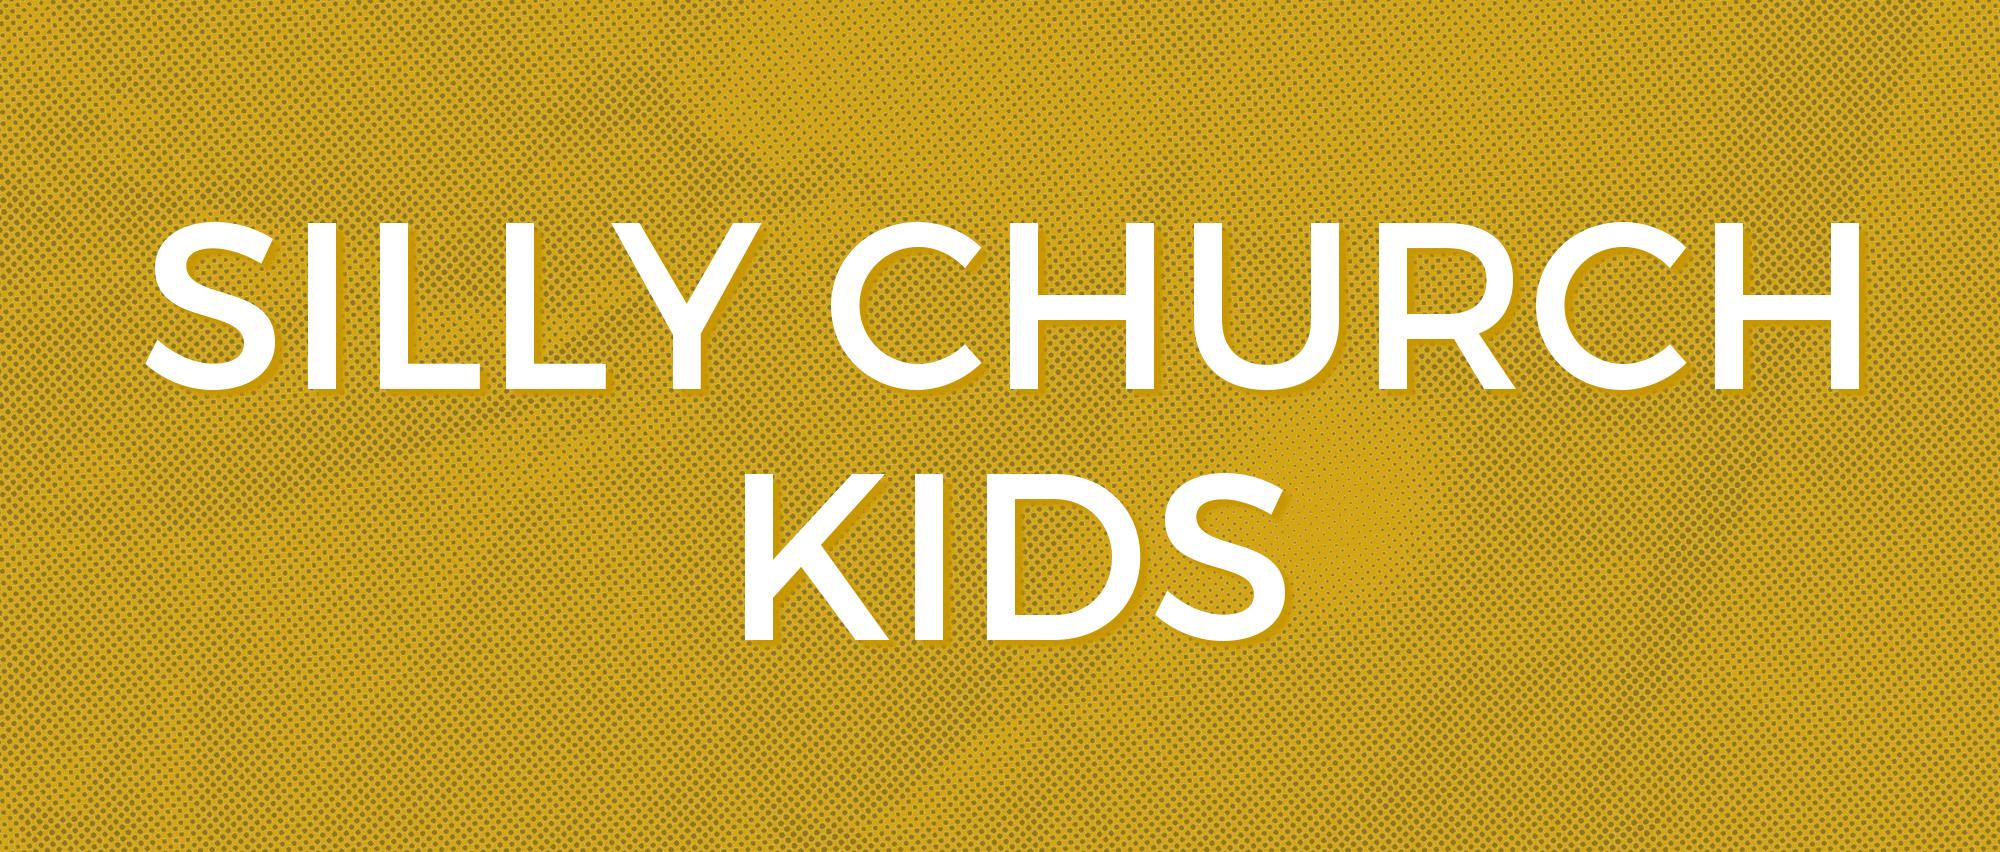 Silly Church Kids.jpg